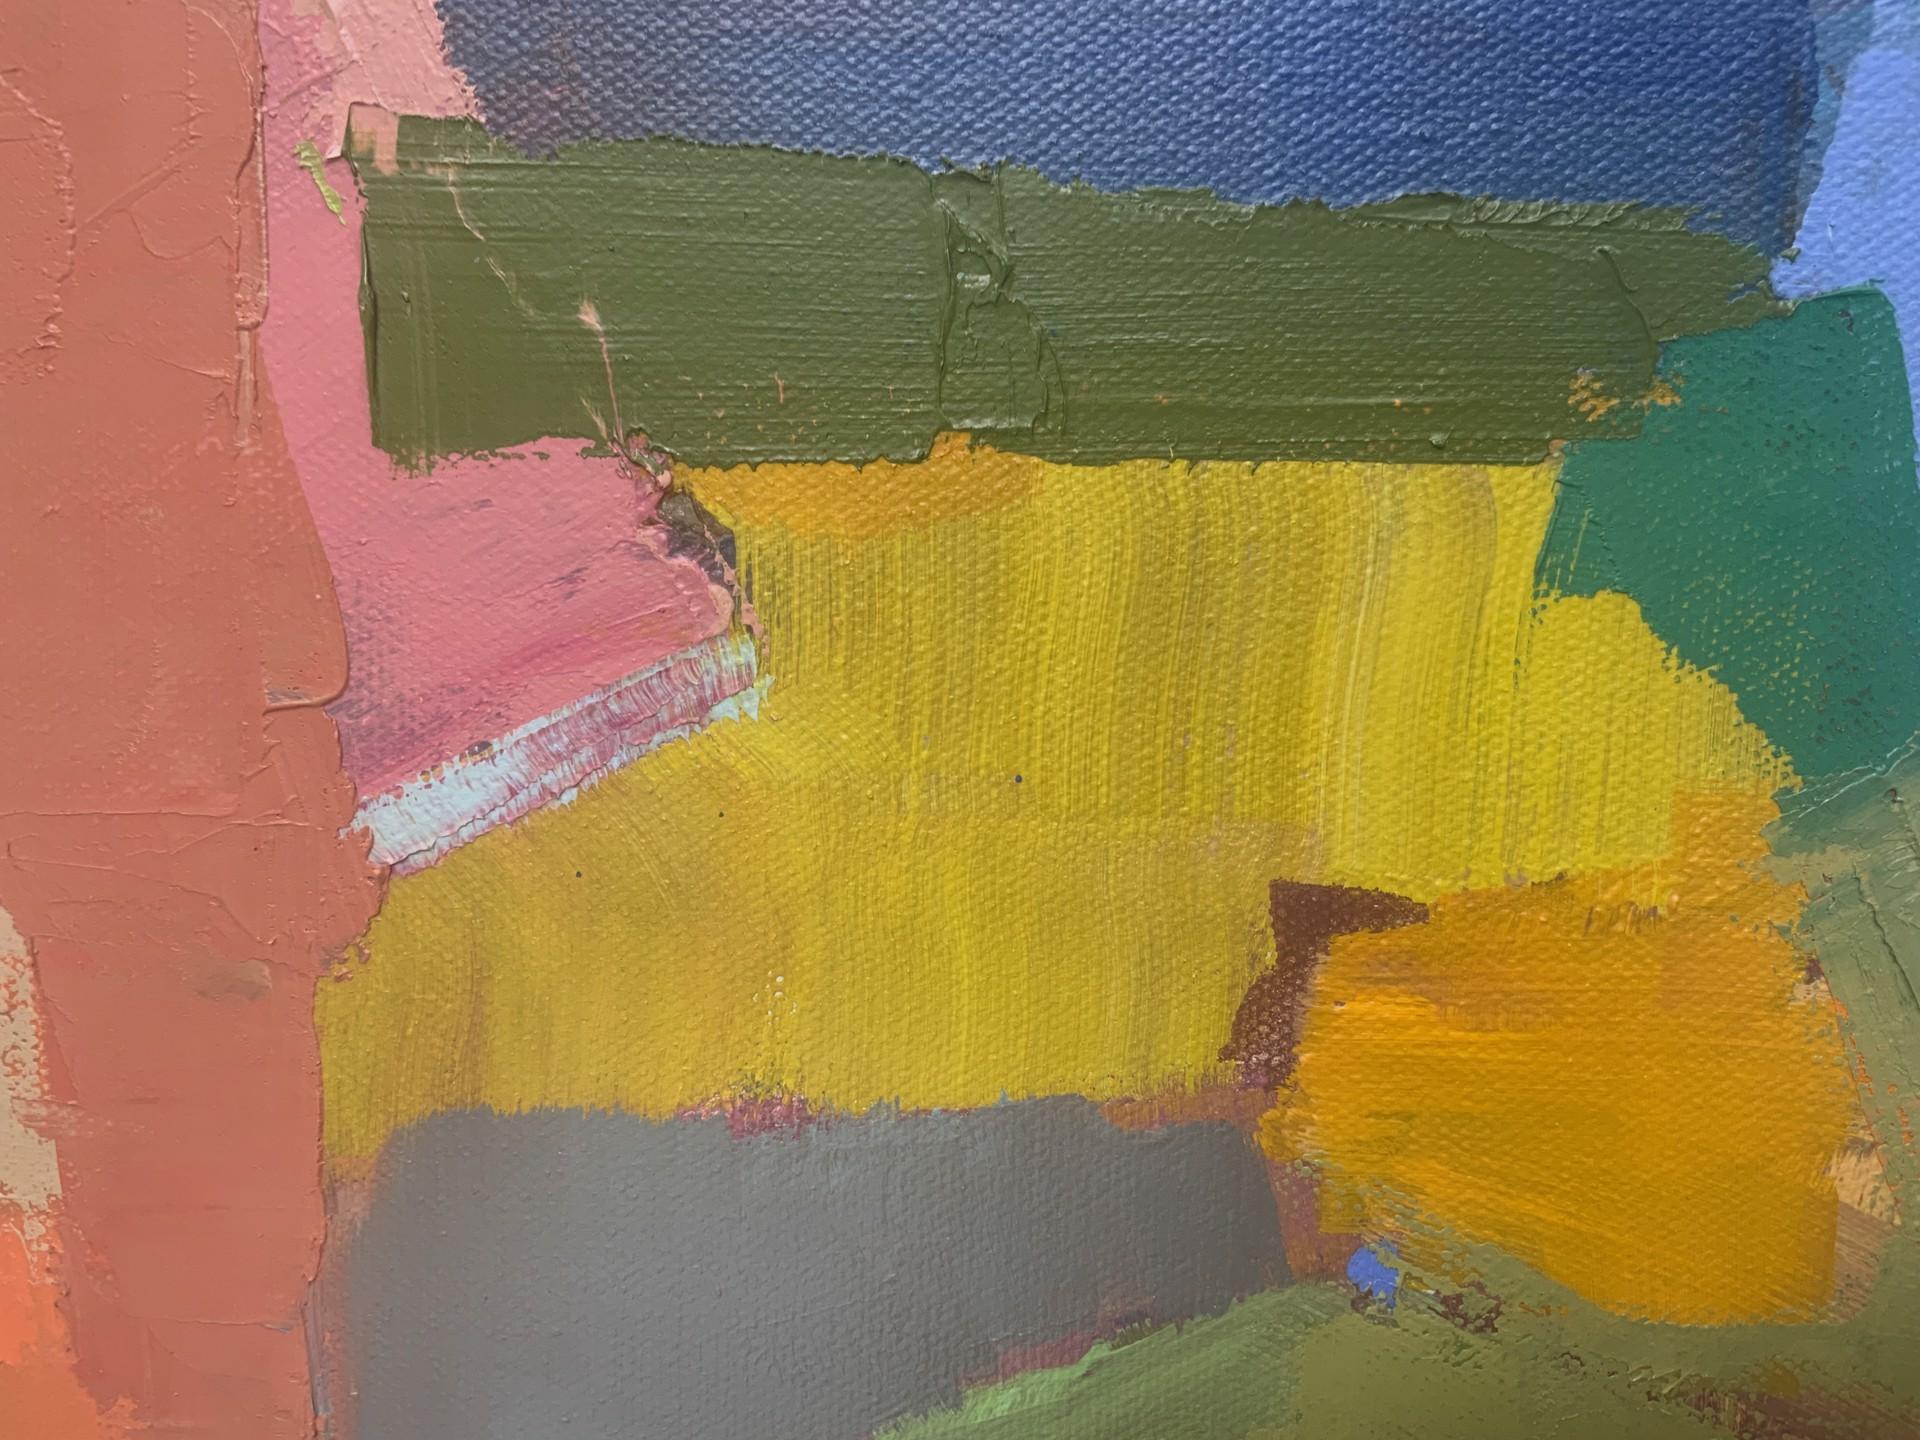 Abstract Landscape 11v2 by stevenpage prewitt